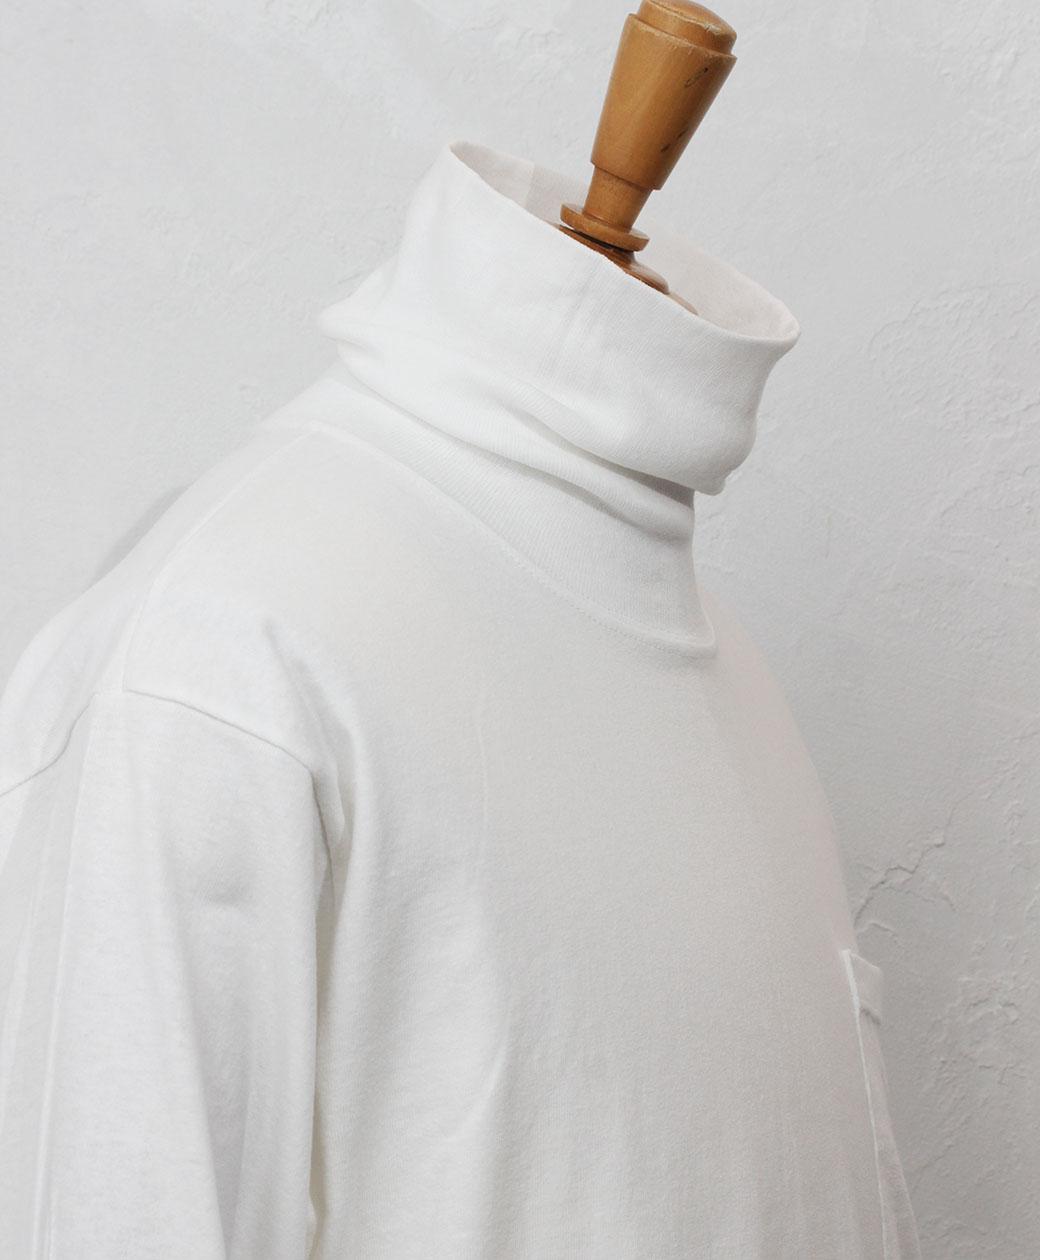 LIFEWEAR TURTLE NECK LONG SLEEVE T-SHIRT(WHITE)